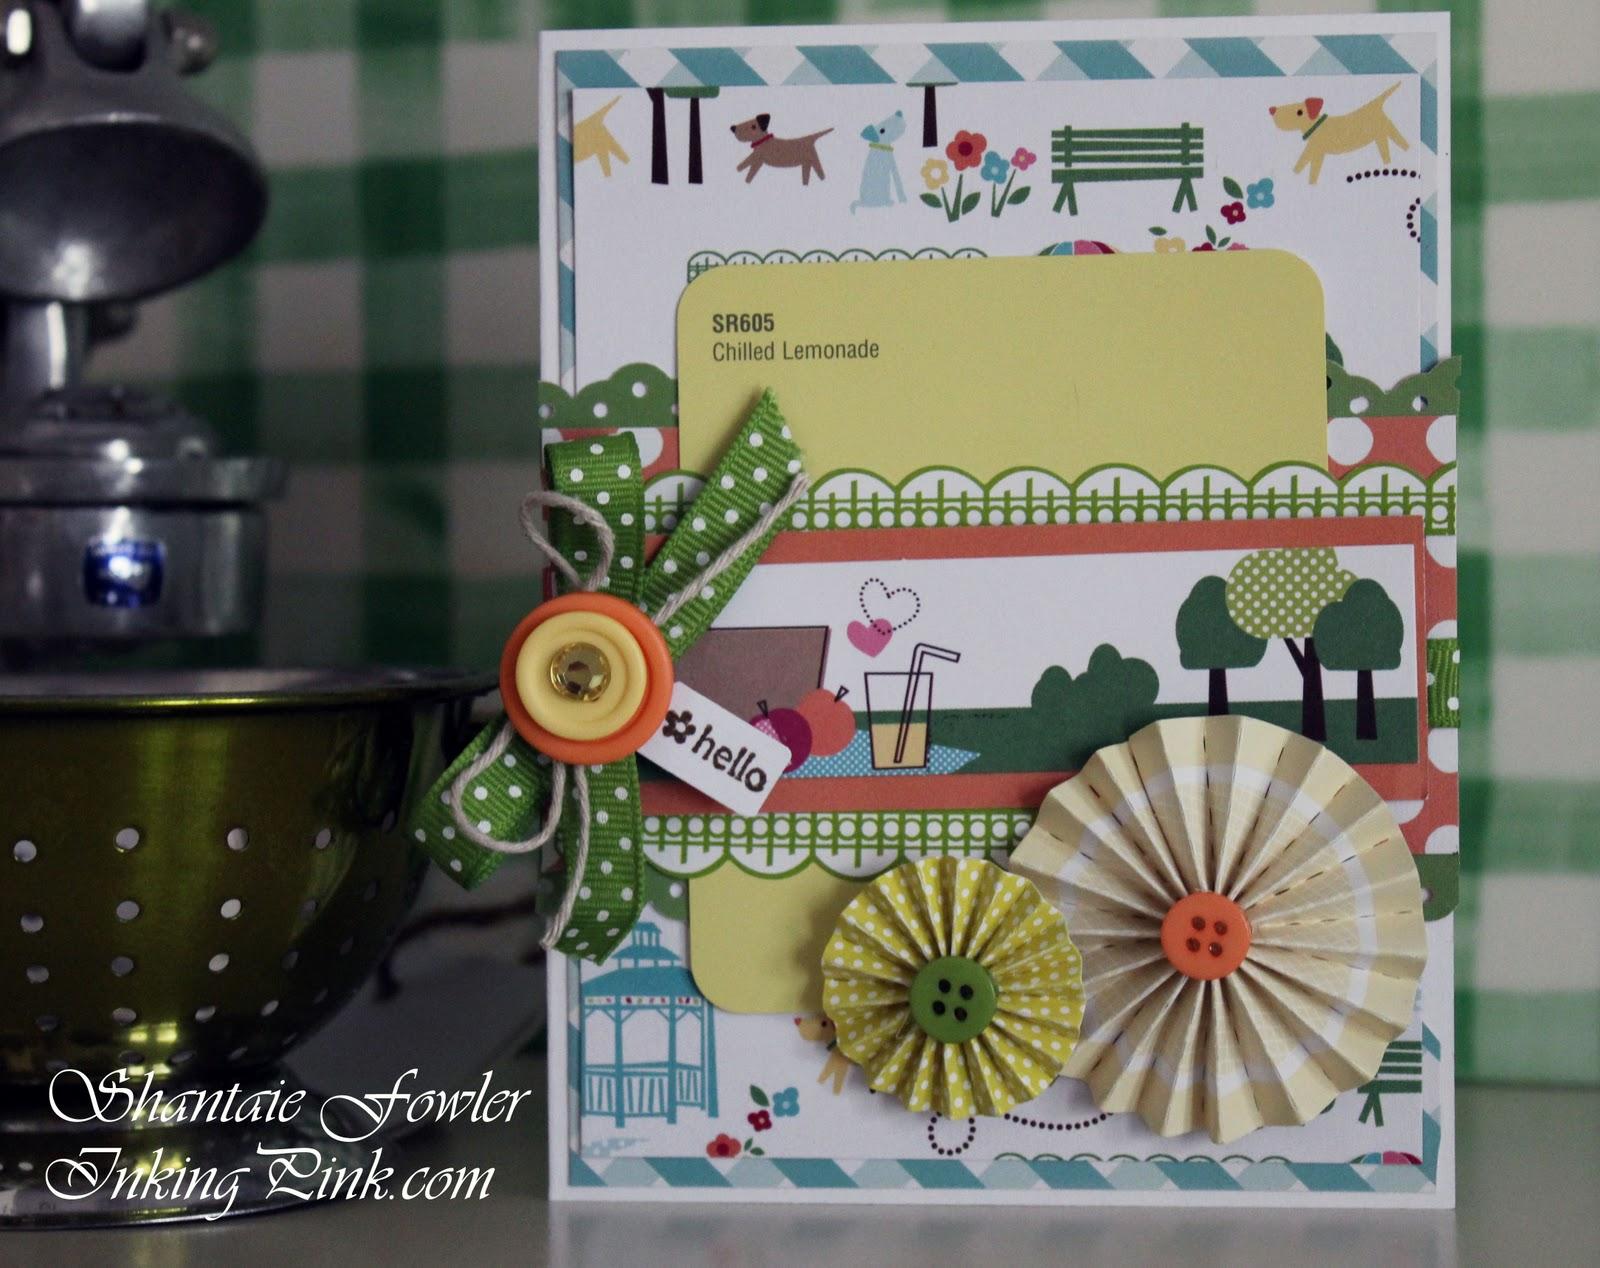 http://3.bp.blogspot.com/-WLWkJMh8WaA/TWf0syKhD0I/AAAAAAAAEWo/FnS0b5u9GIQ/s1600/Paint+chip+papercrafting+006.JPG